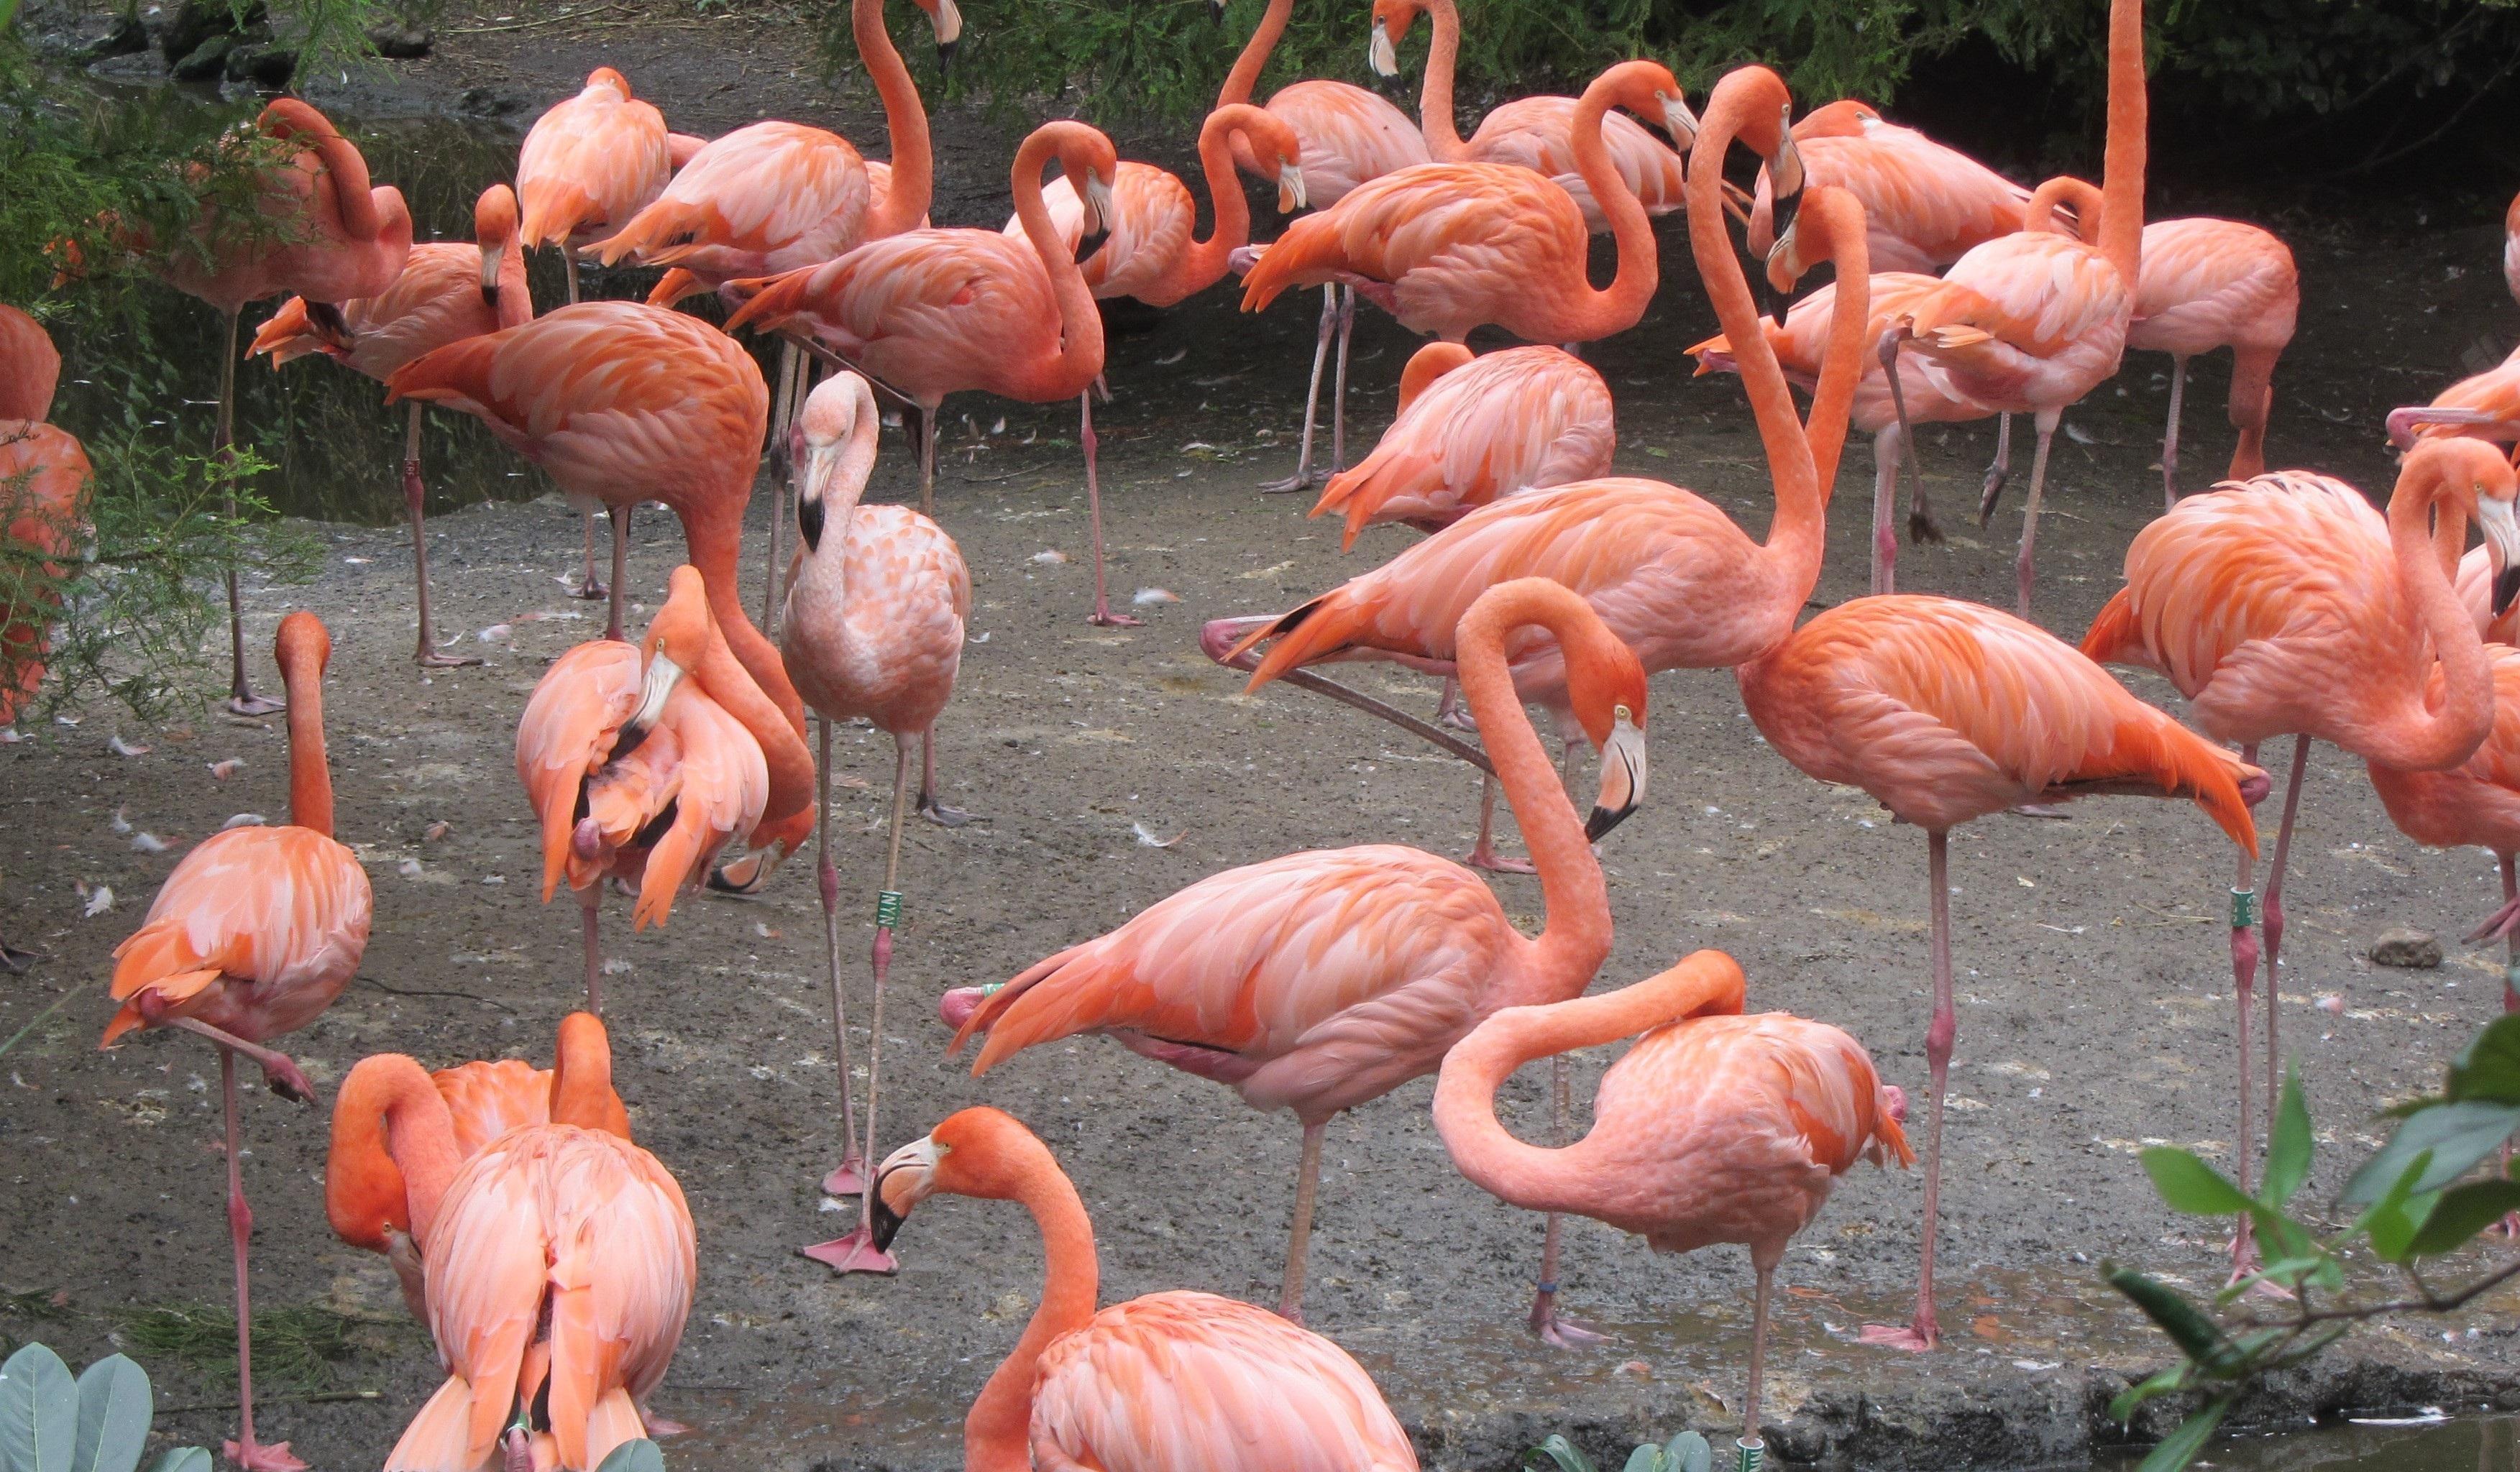 banco de imagens jardim zoológico bico rosa fauna flamingo